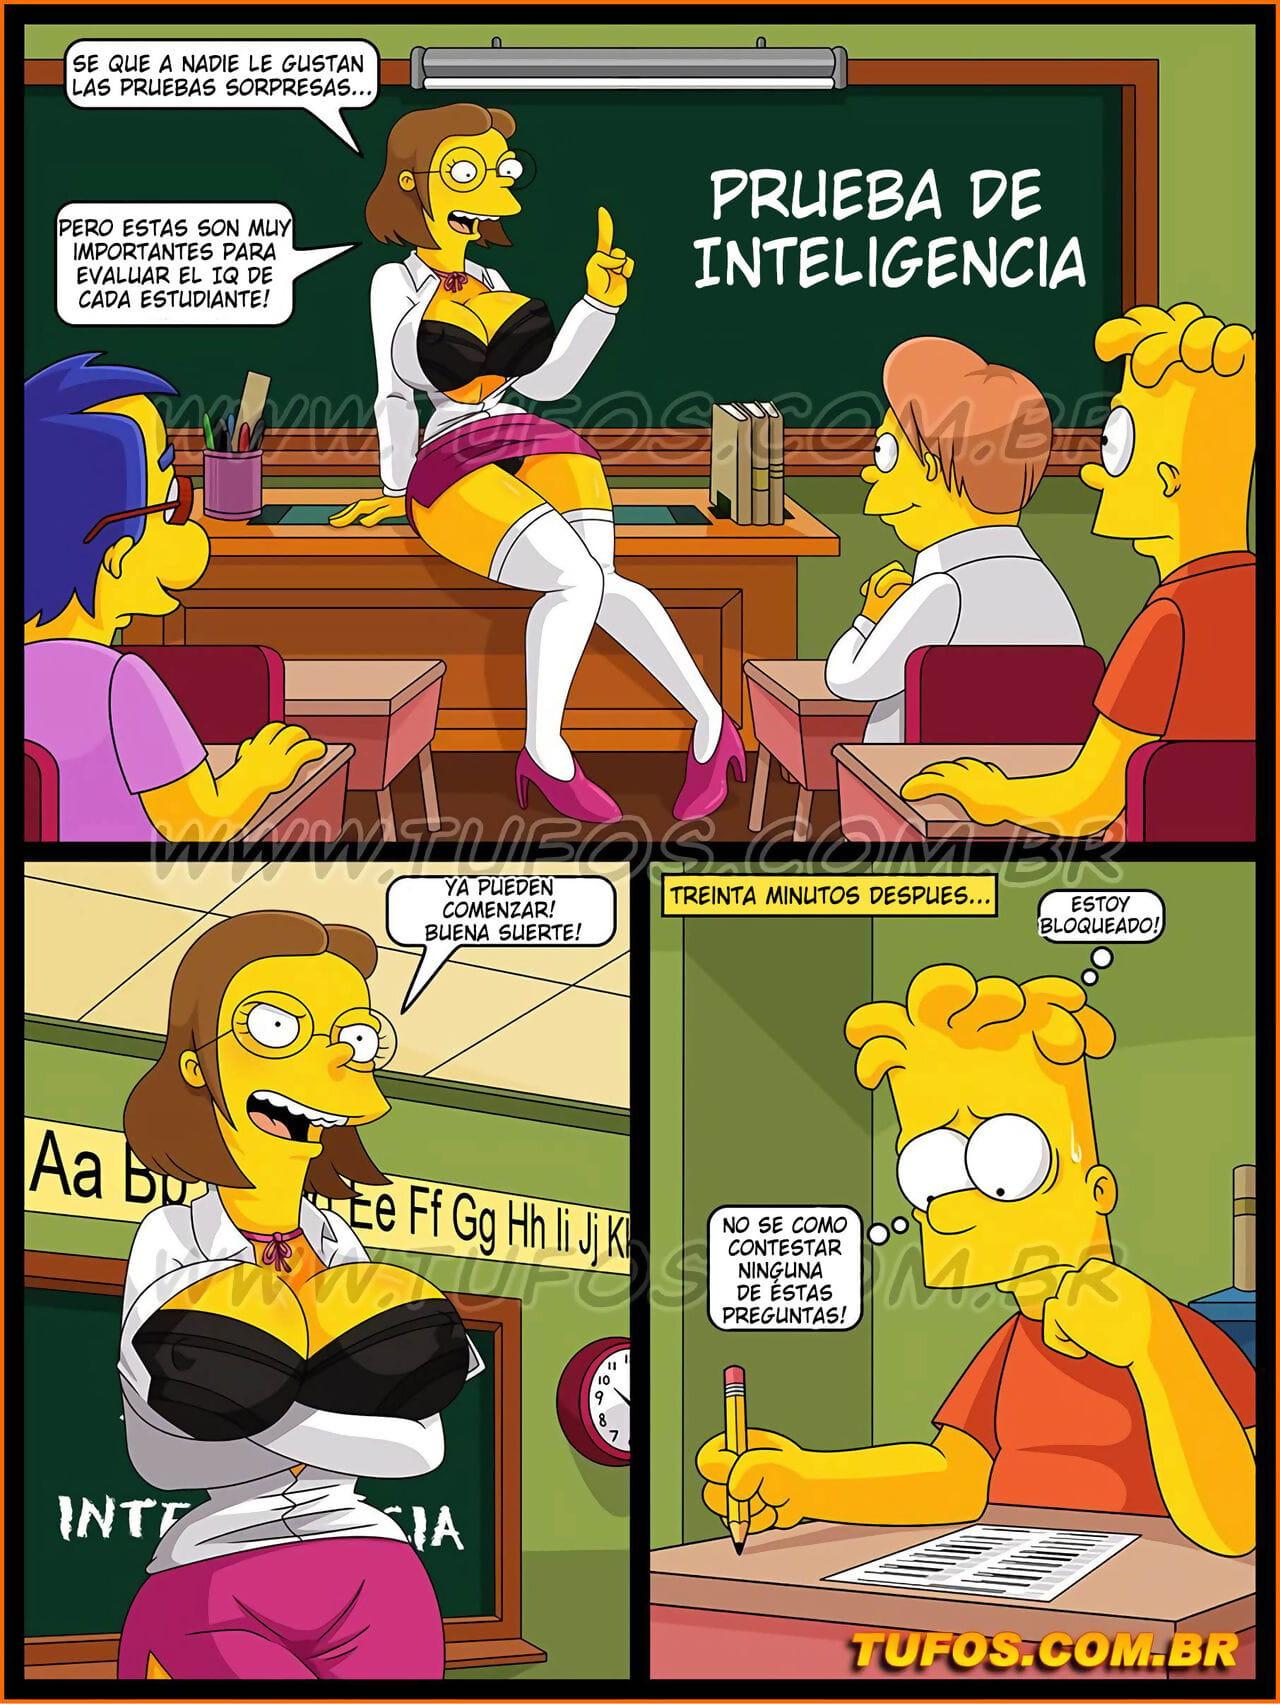 prueba دي inteligencia الإسبانية los.. في xxxcomicporn.com